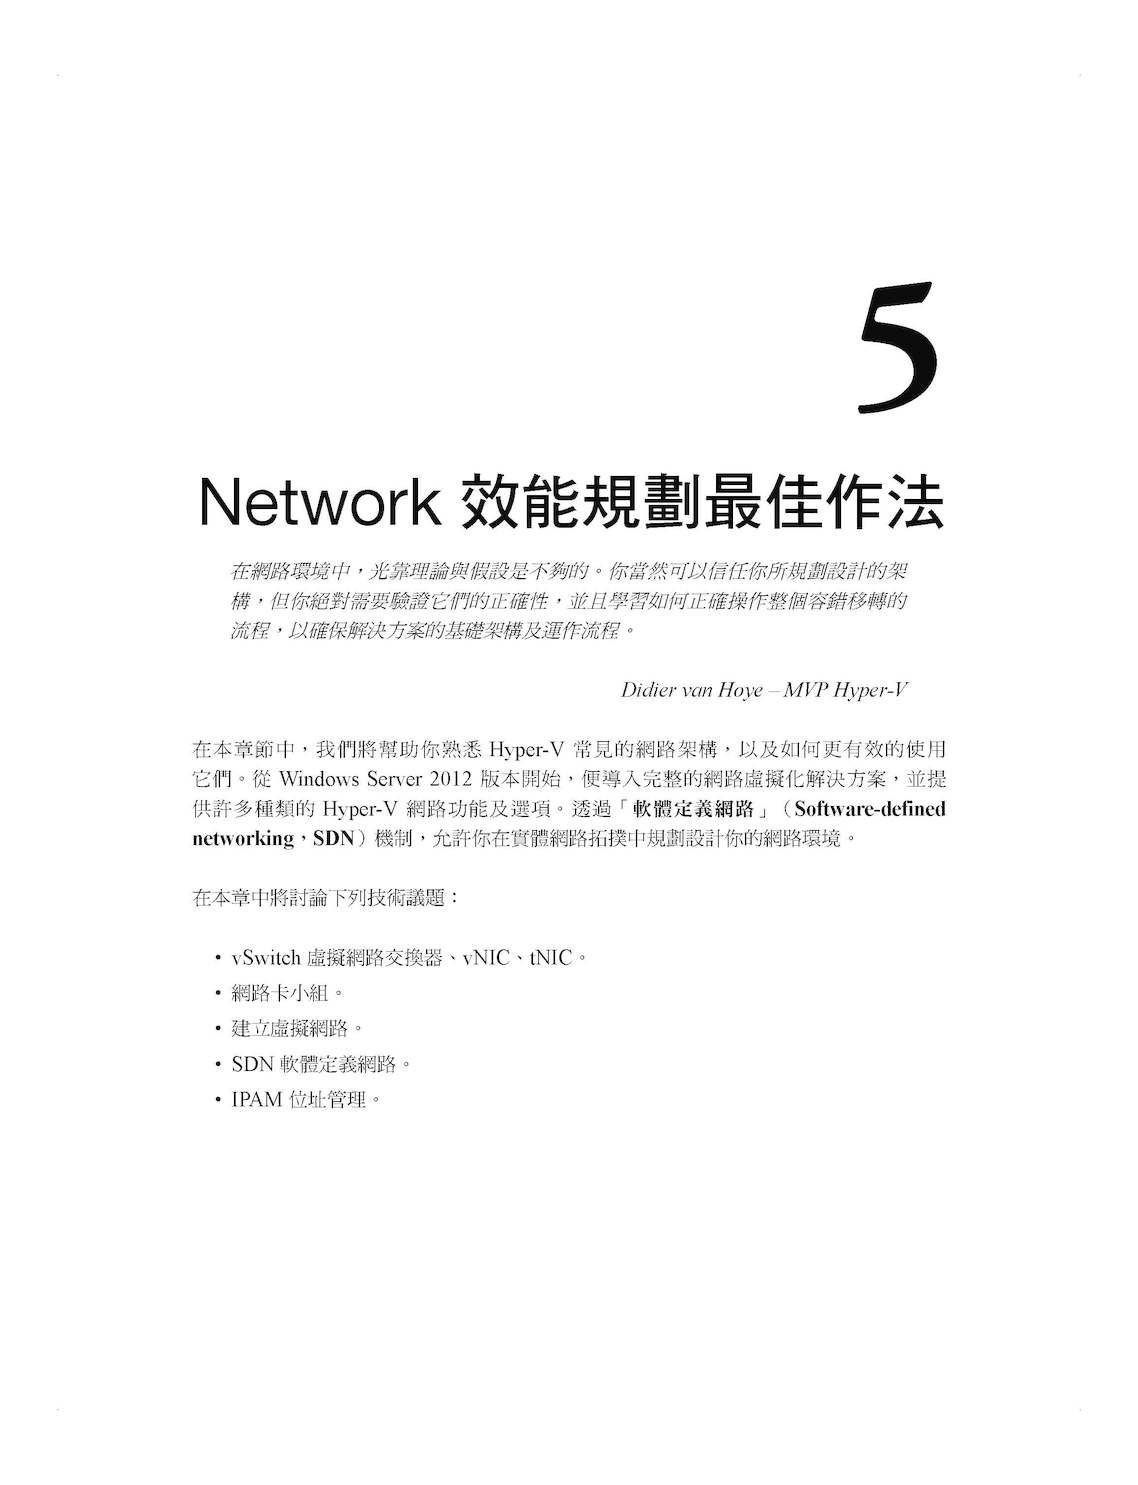 Hyper-V 最佳實踐:快速建置虛擬化解決方案 (Hyper-V Best Practices)-preview-5